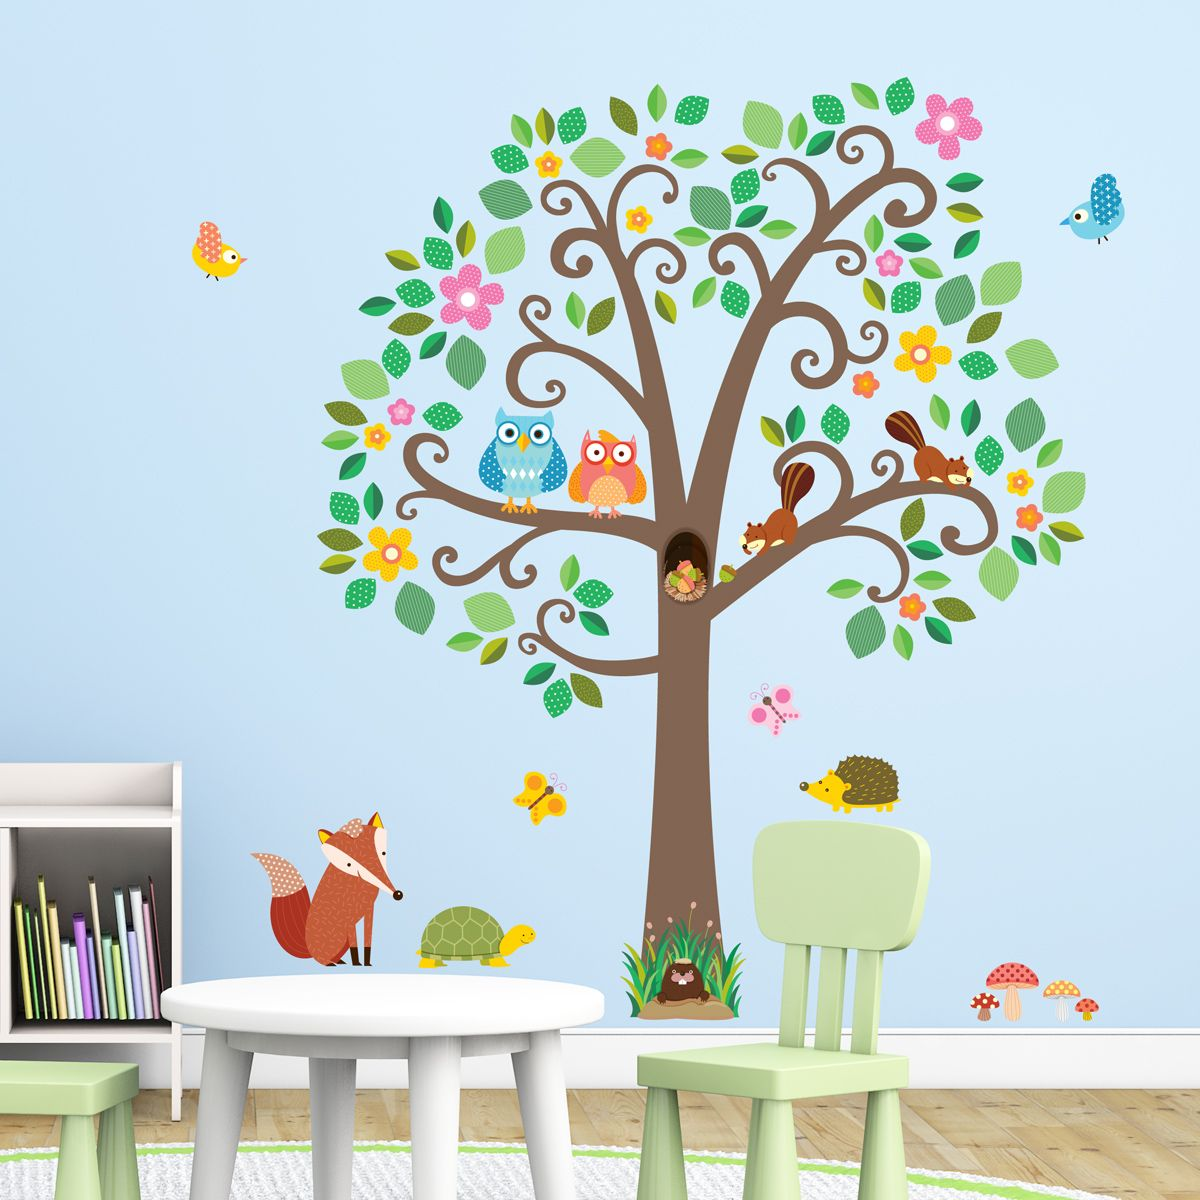 Large Scroll Tree & Animals Nursery Wall Stickers https ...